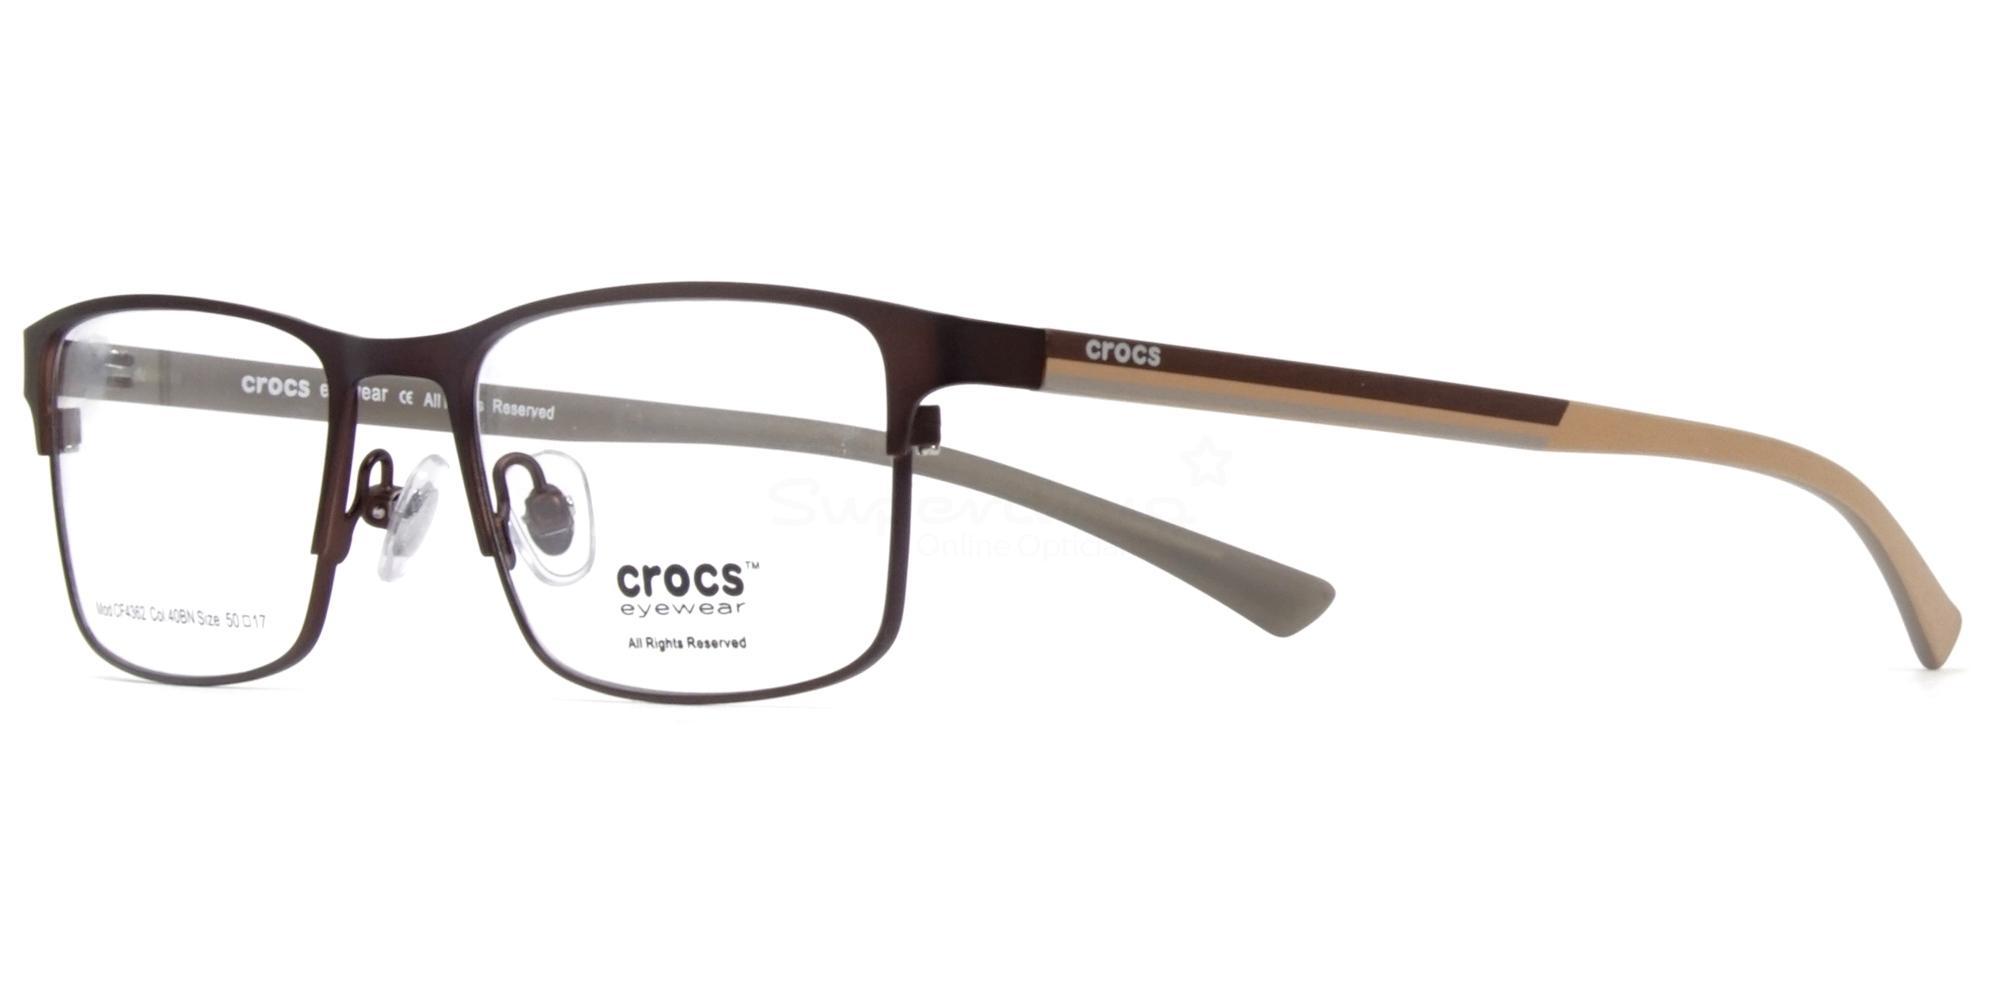 40BN CF4362 Glasses, Crocs Eyewear